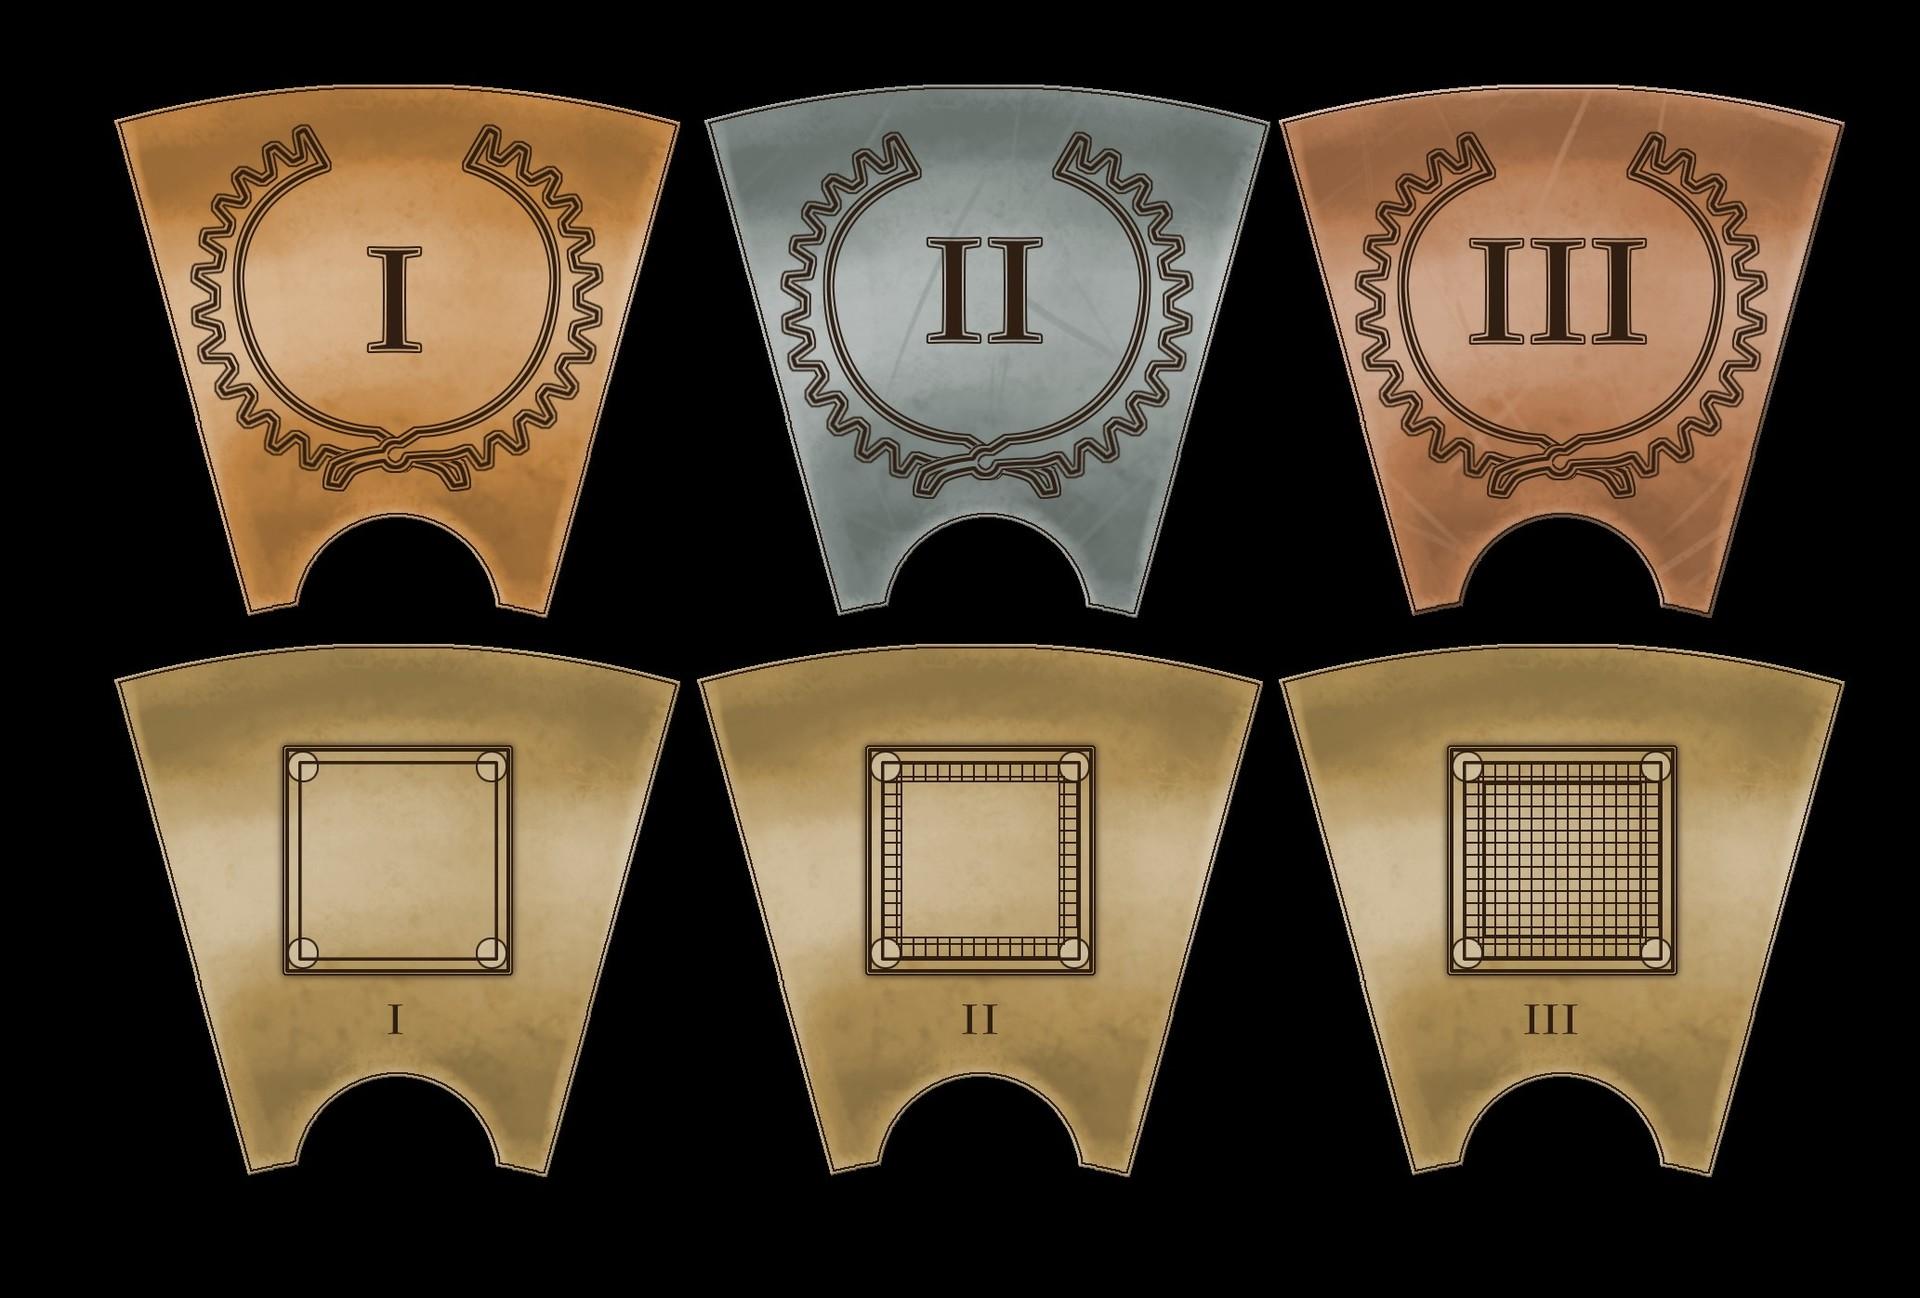 Victor debatisse 11 calendar tiles